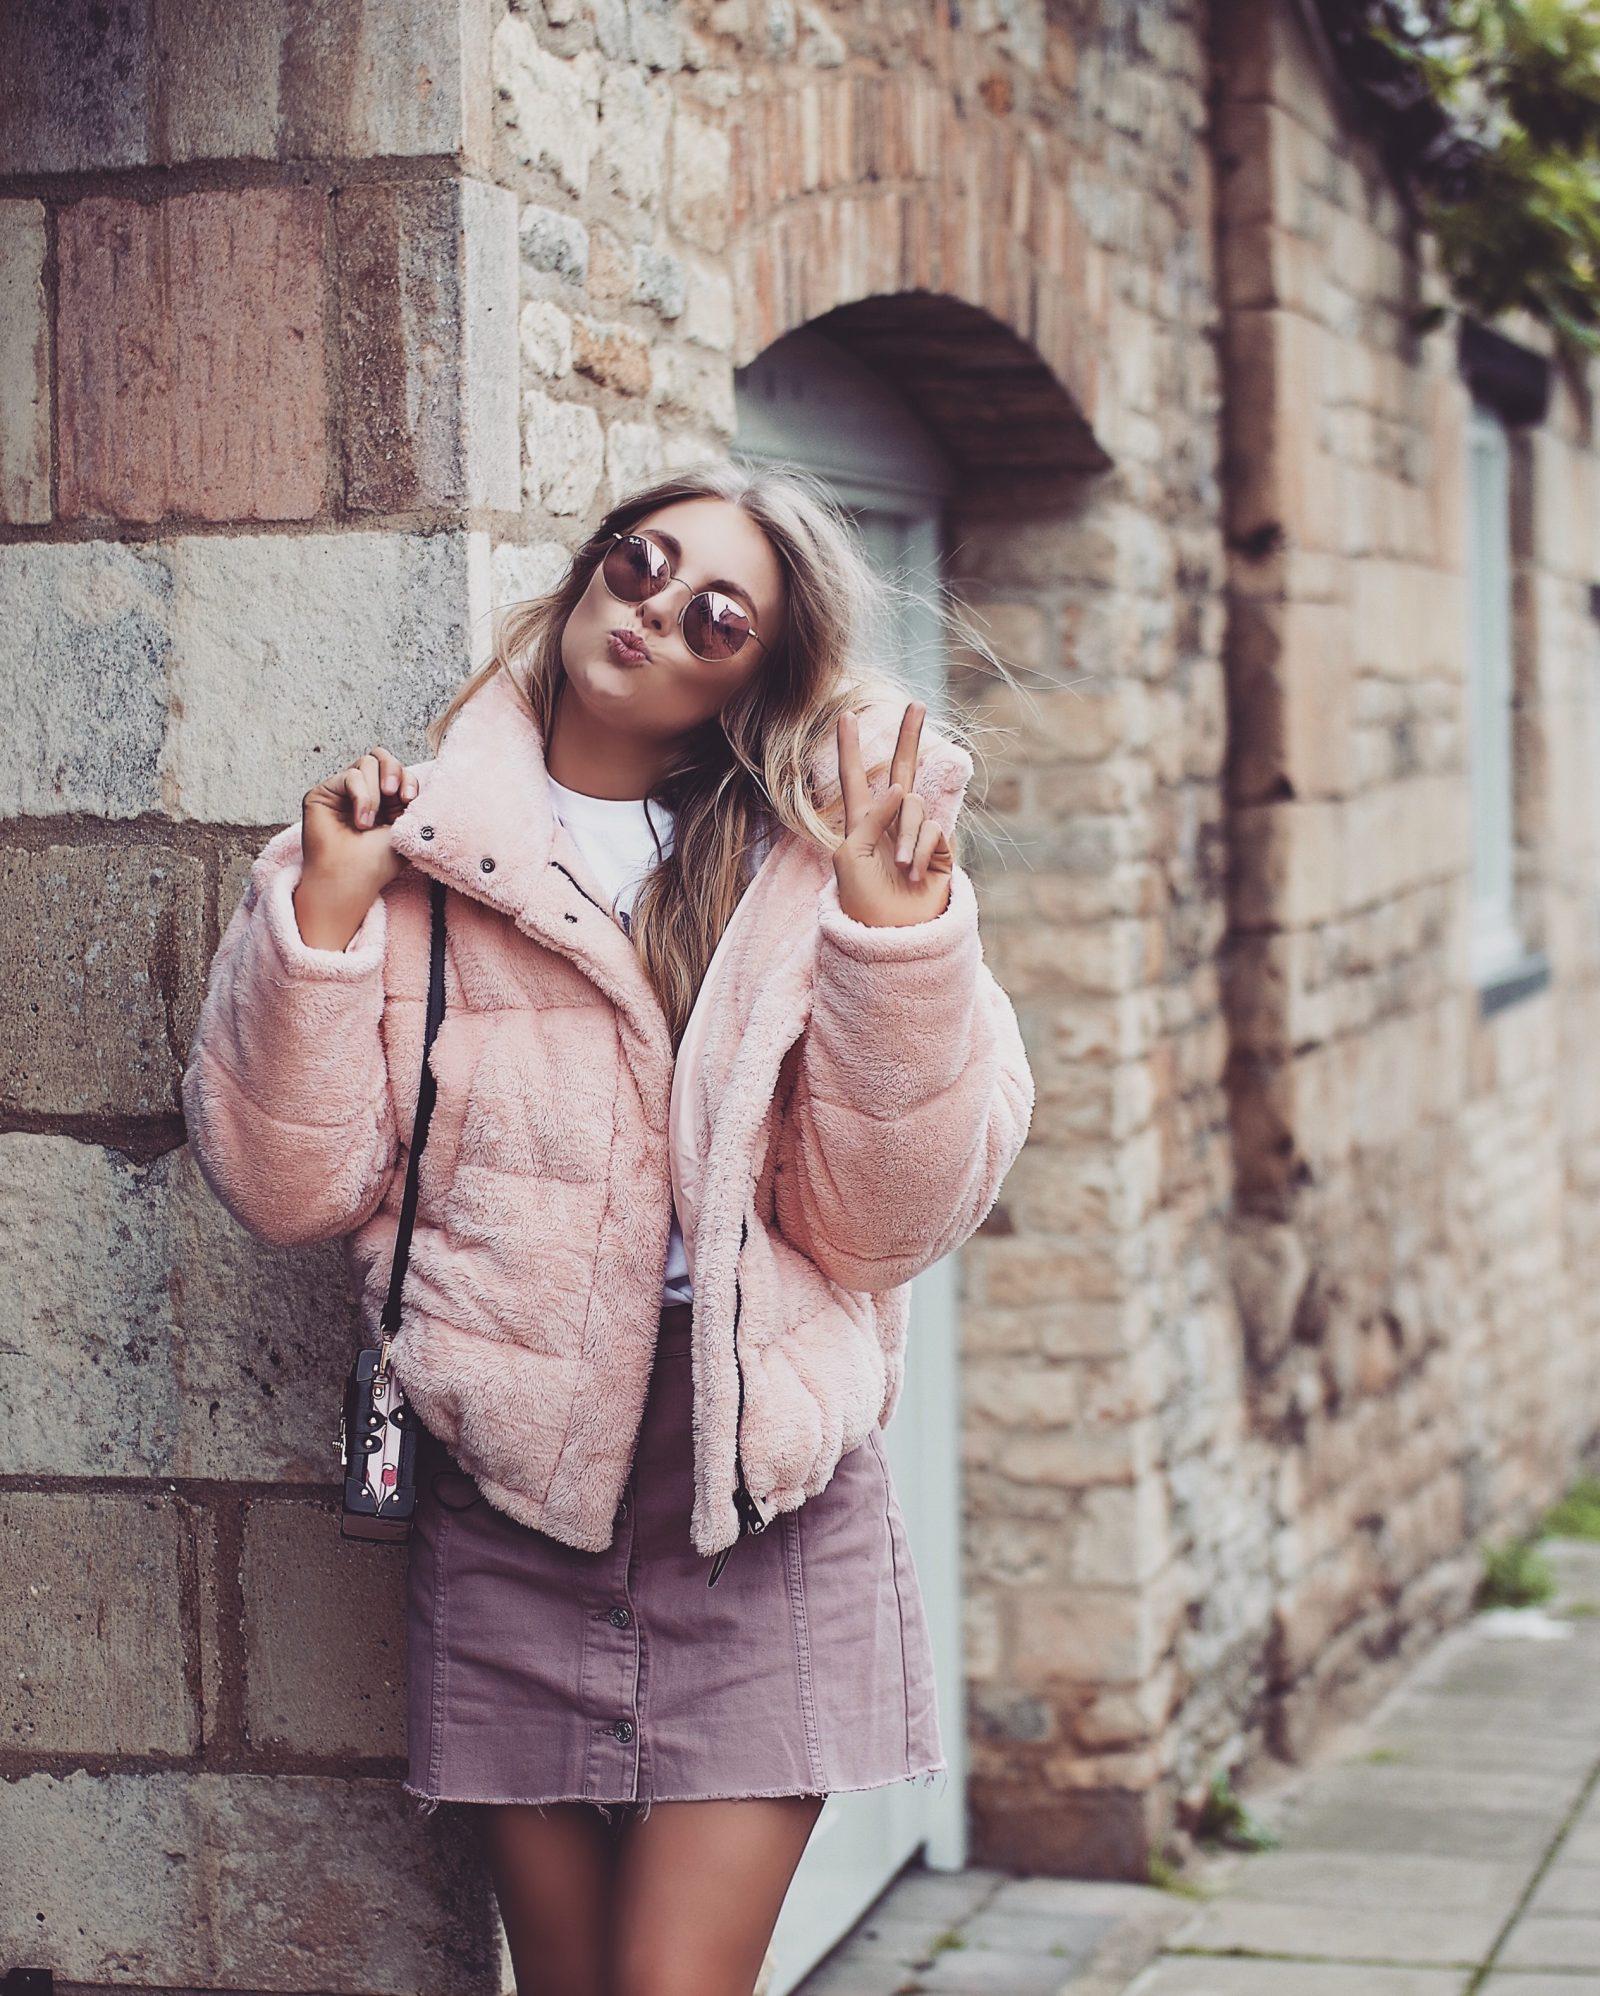 Teddy Puffa Jacket - Autumn Outfit